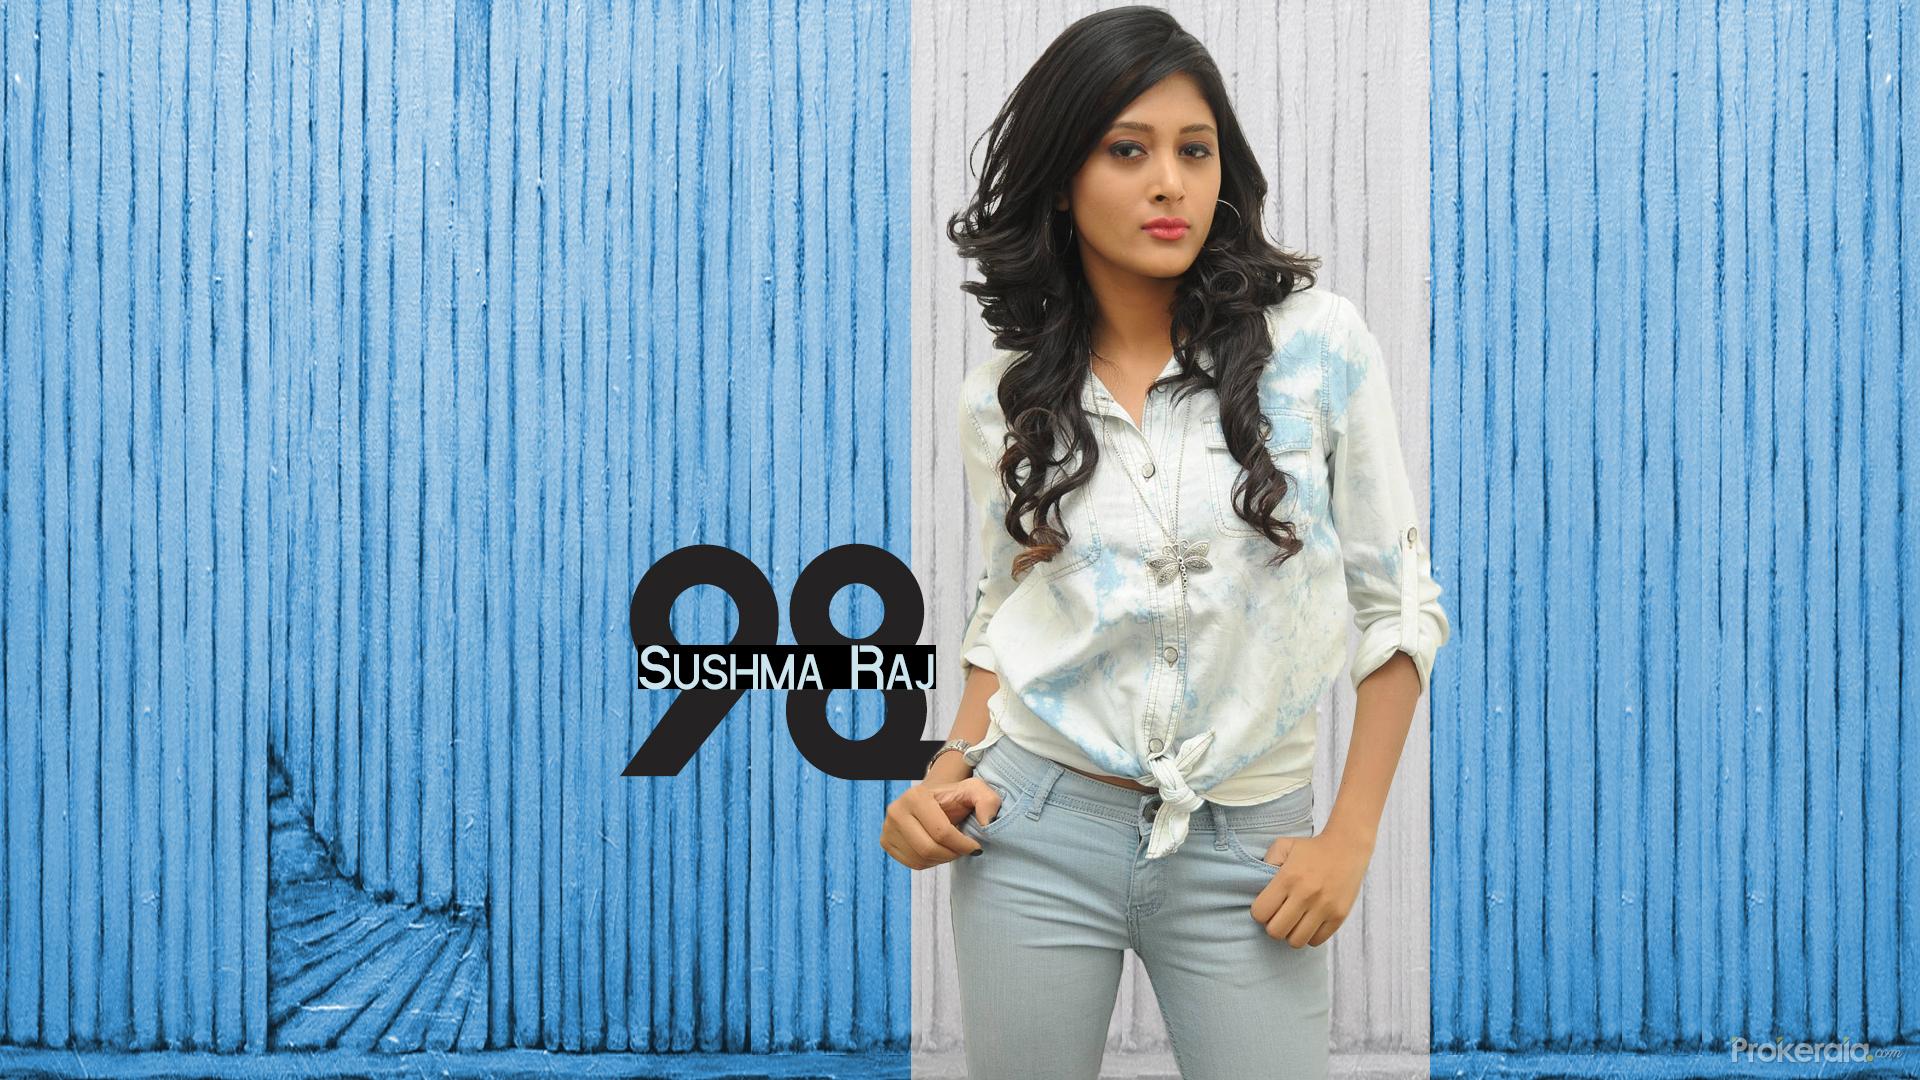 Sushma Raj Hd Wallpapers